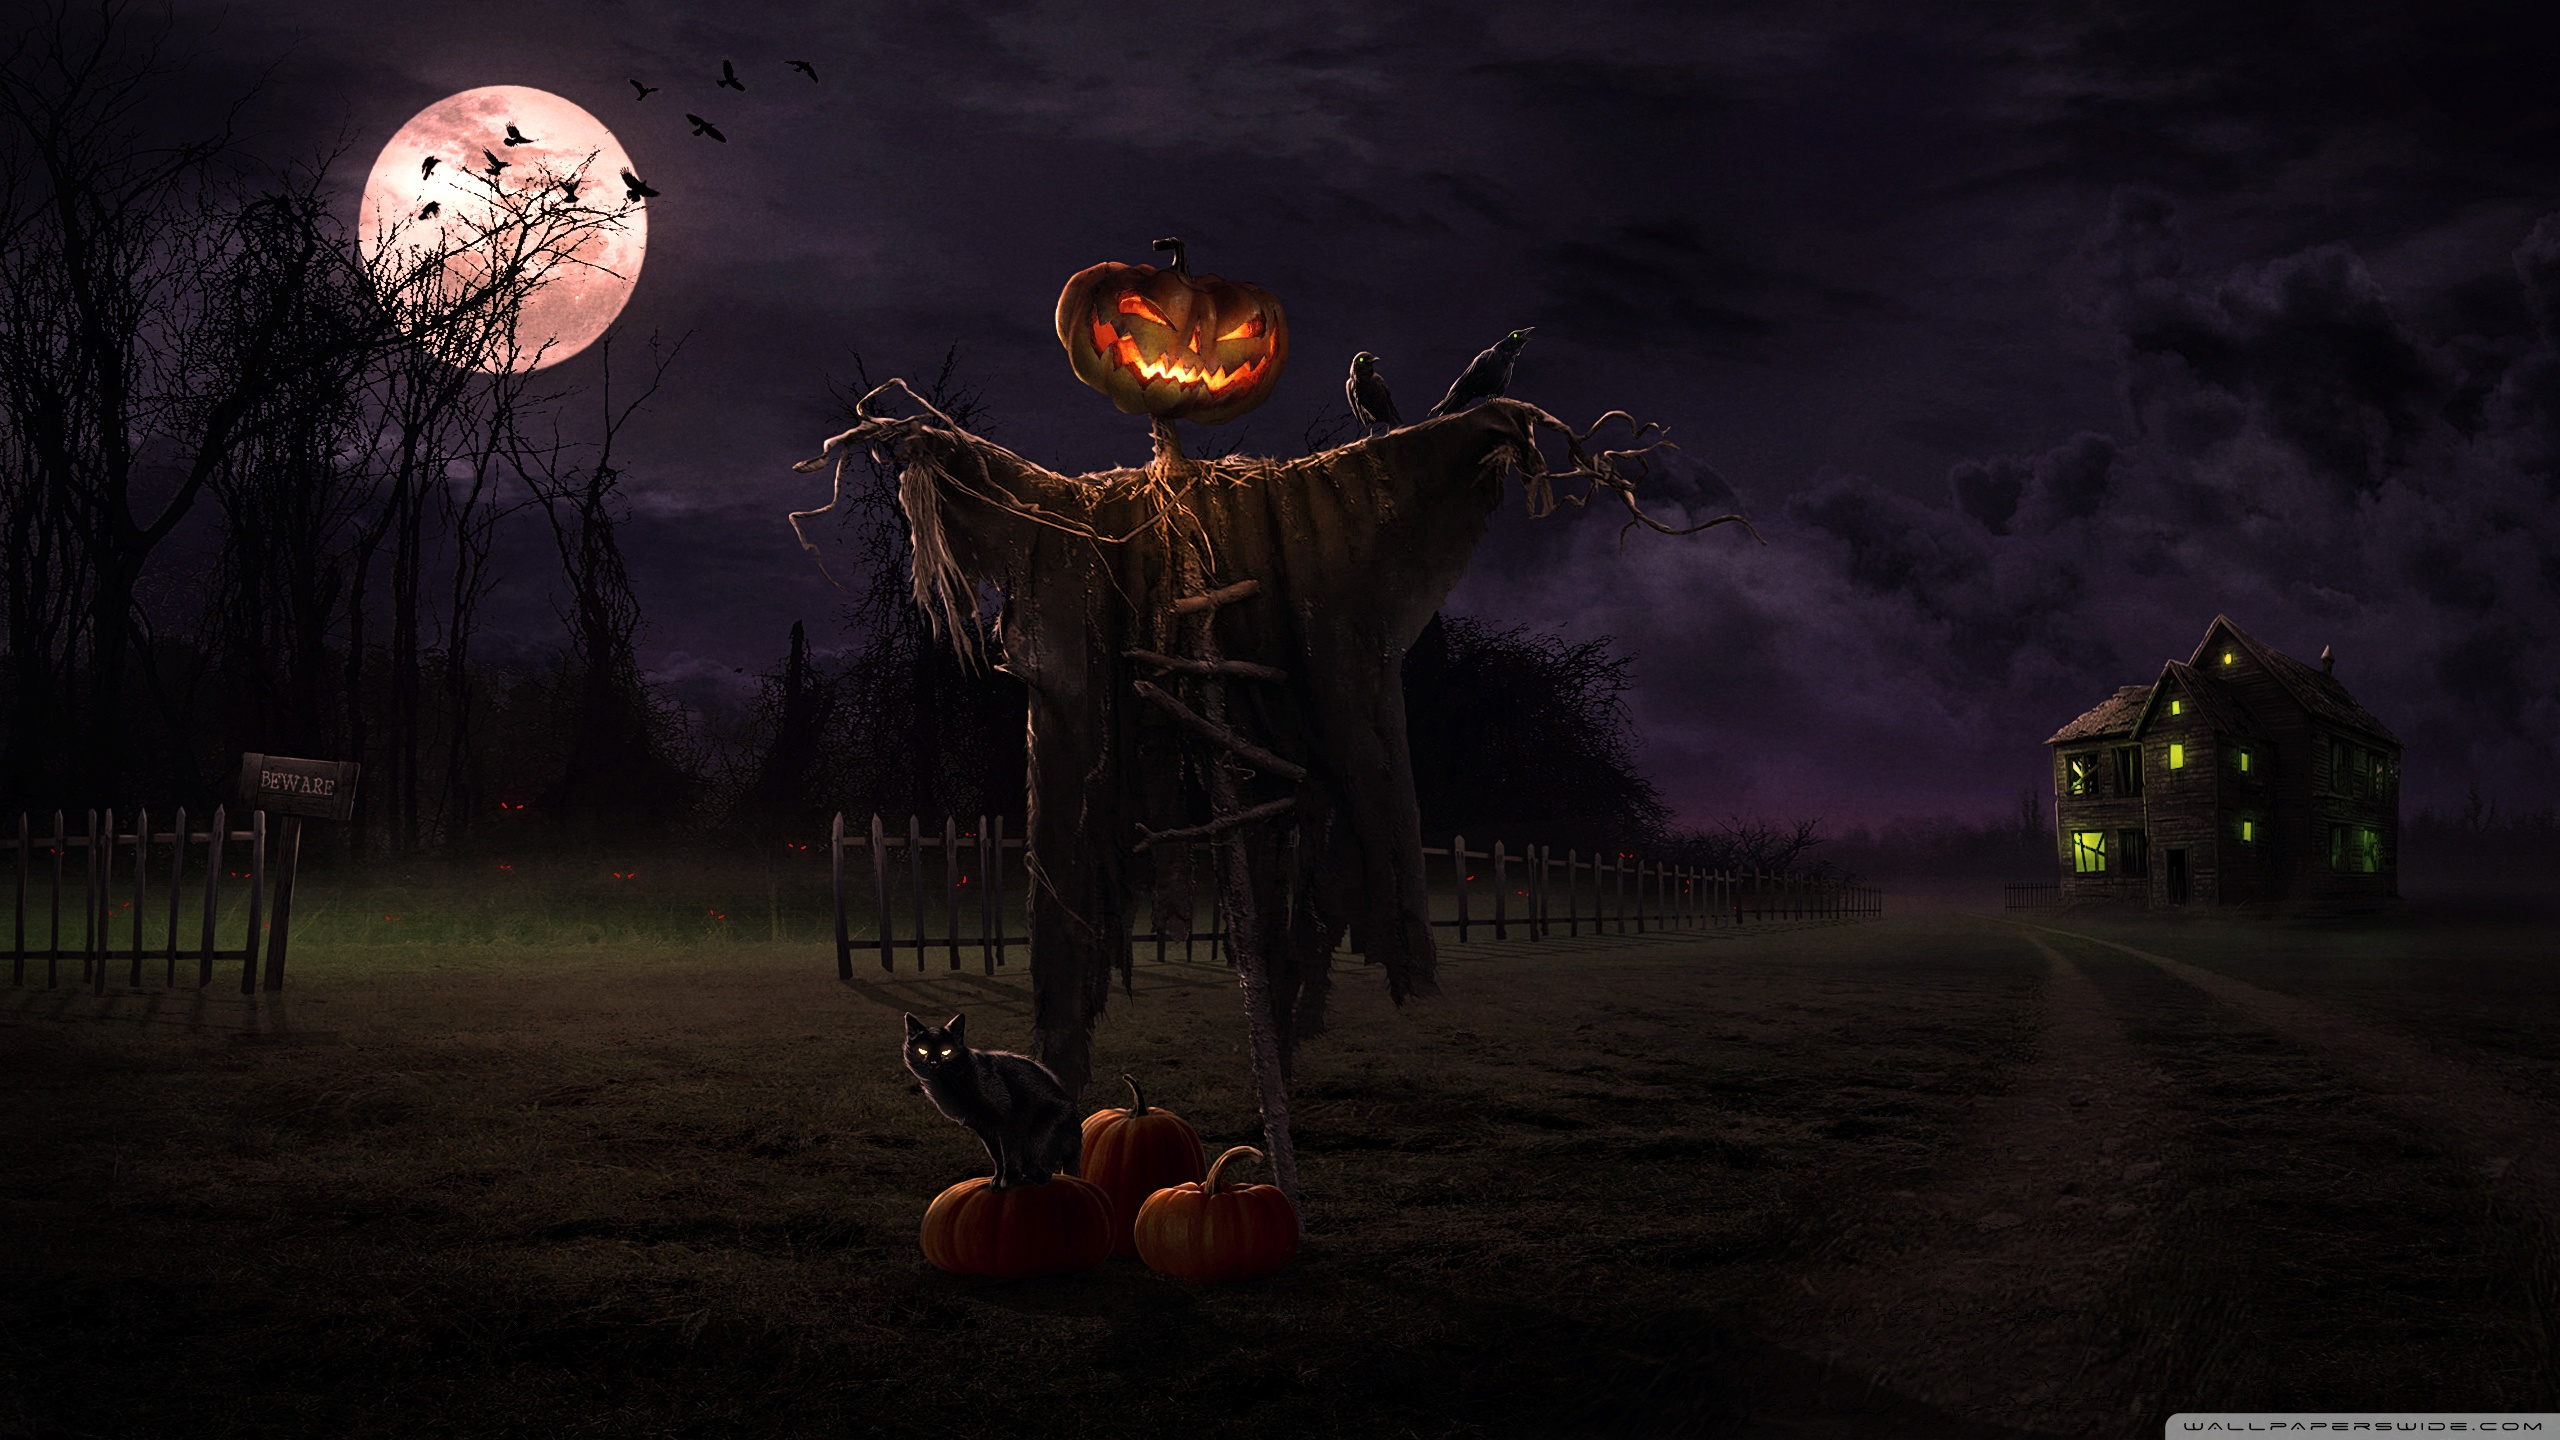 spooky_path-wallpaper-2560x1440